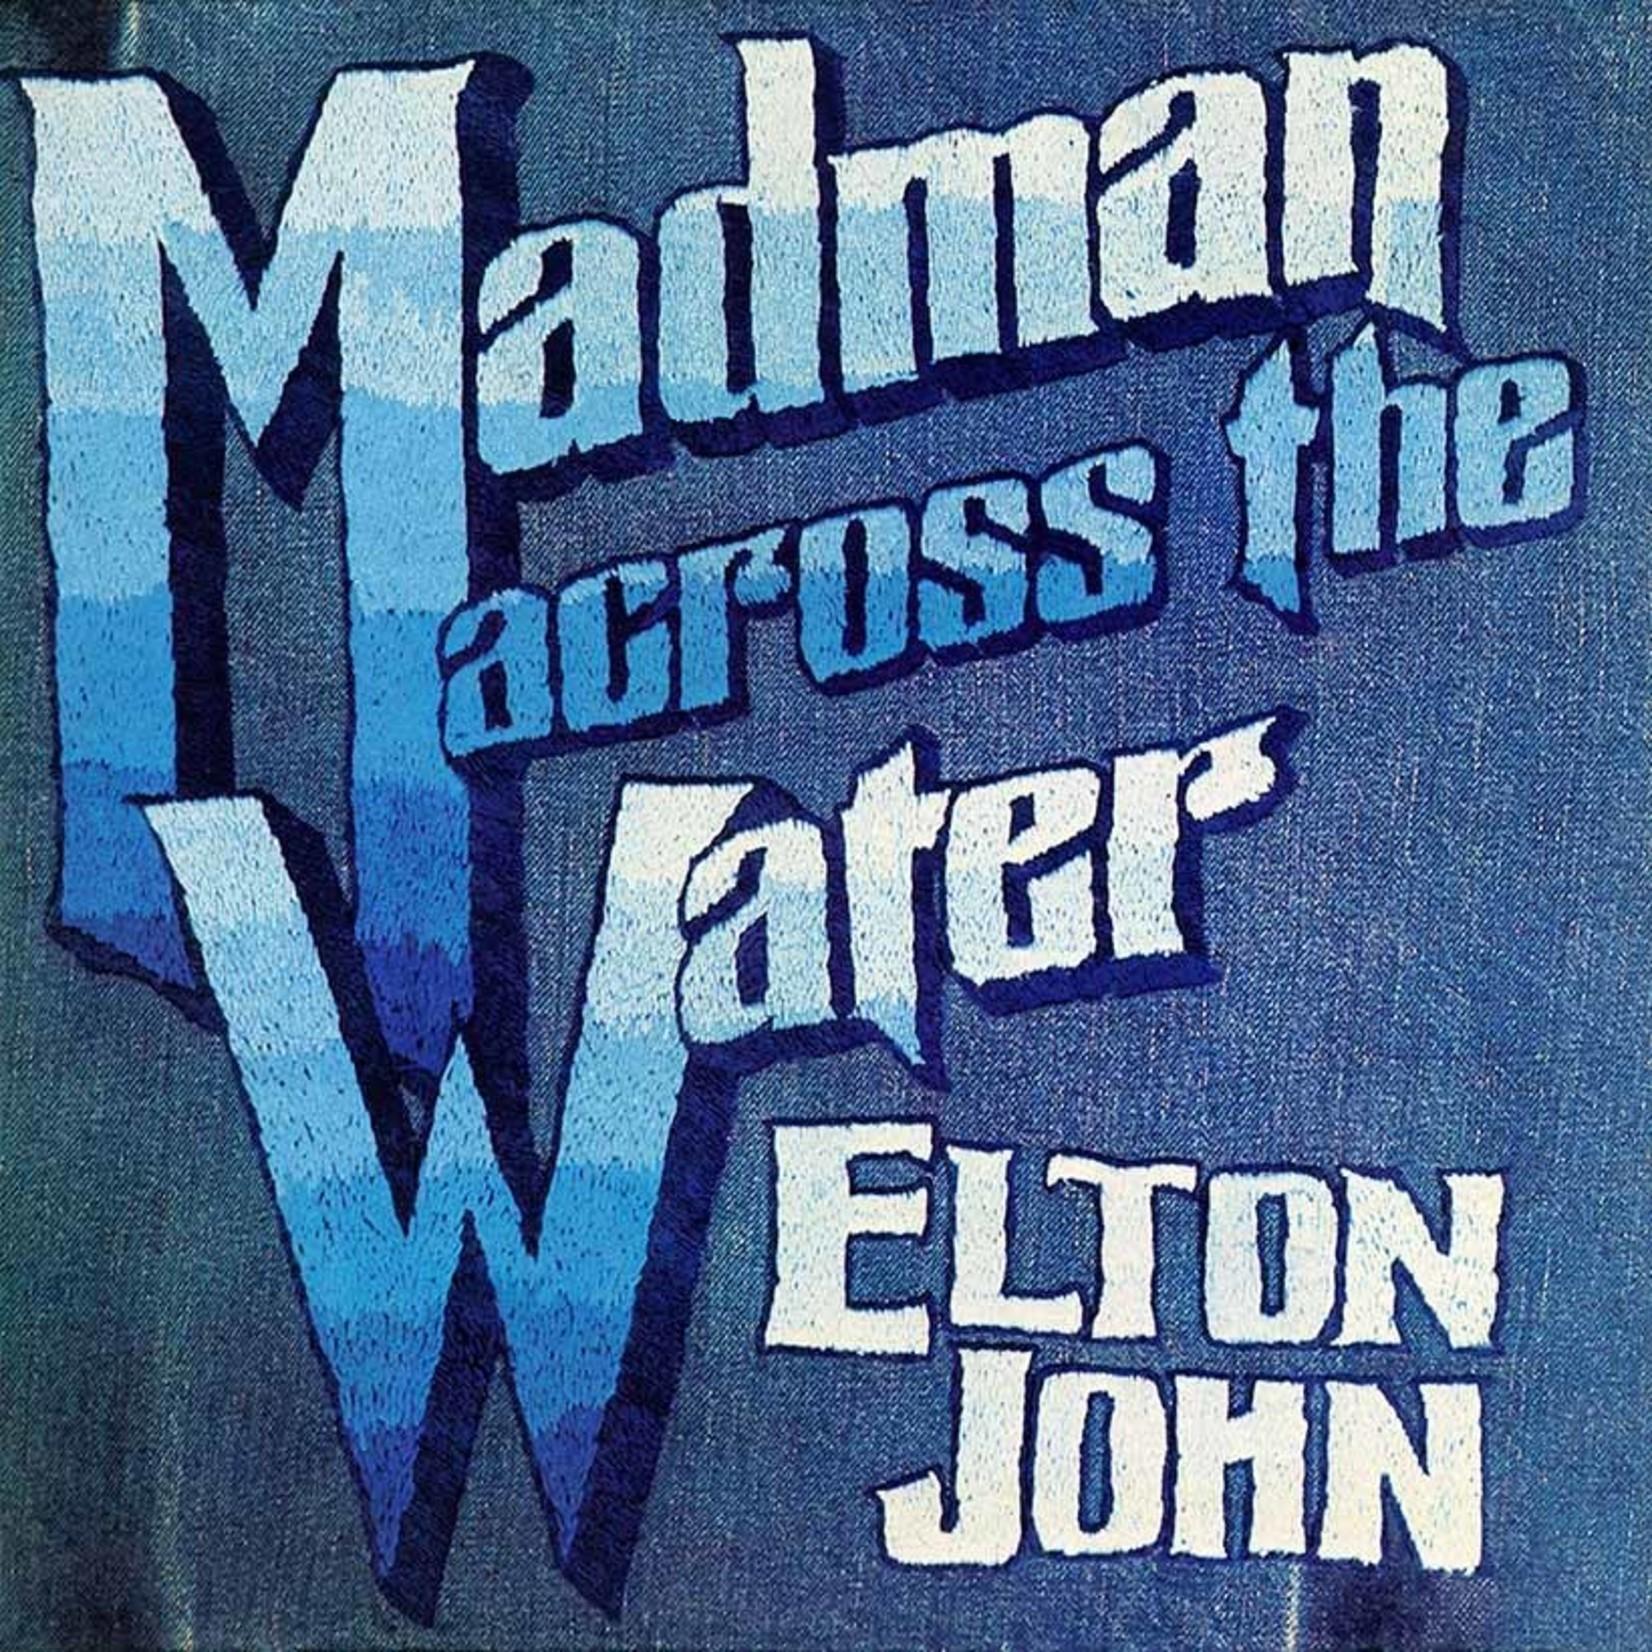 [Vintage] John, Elton: Madman Across the Water